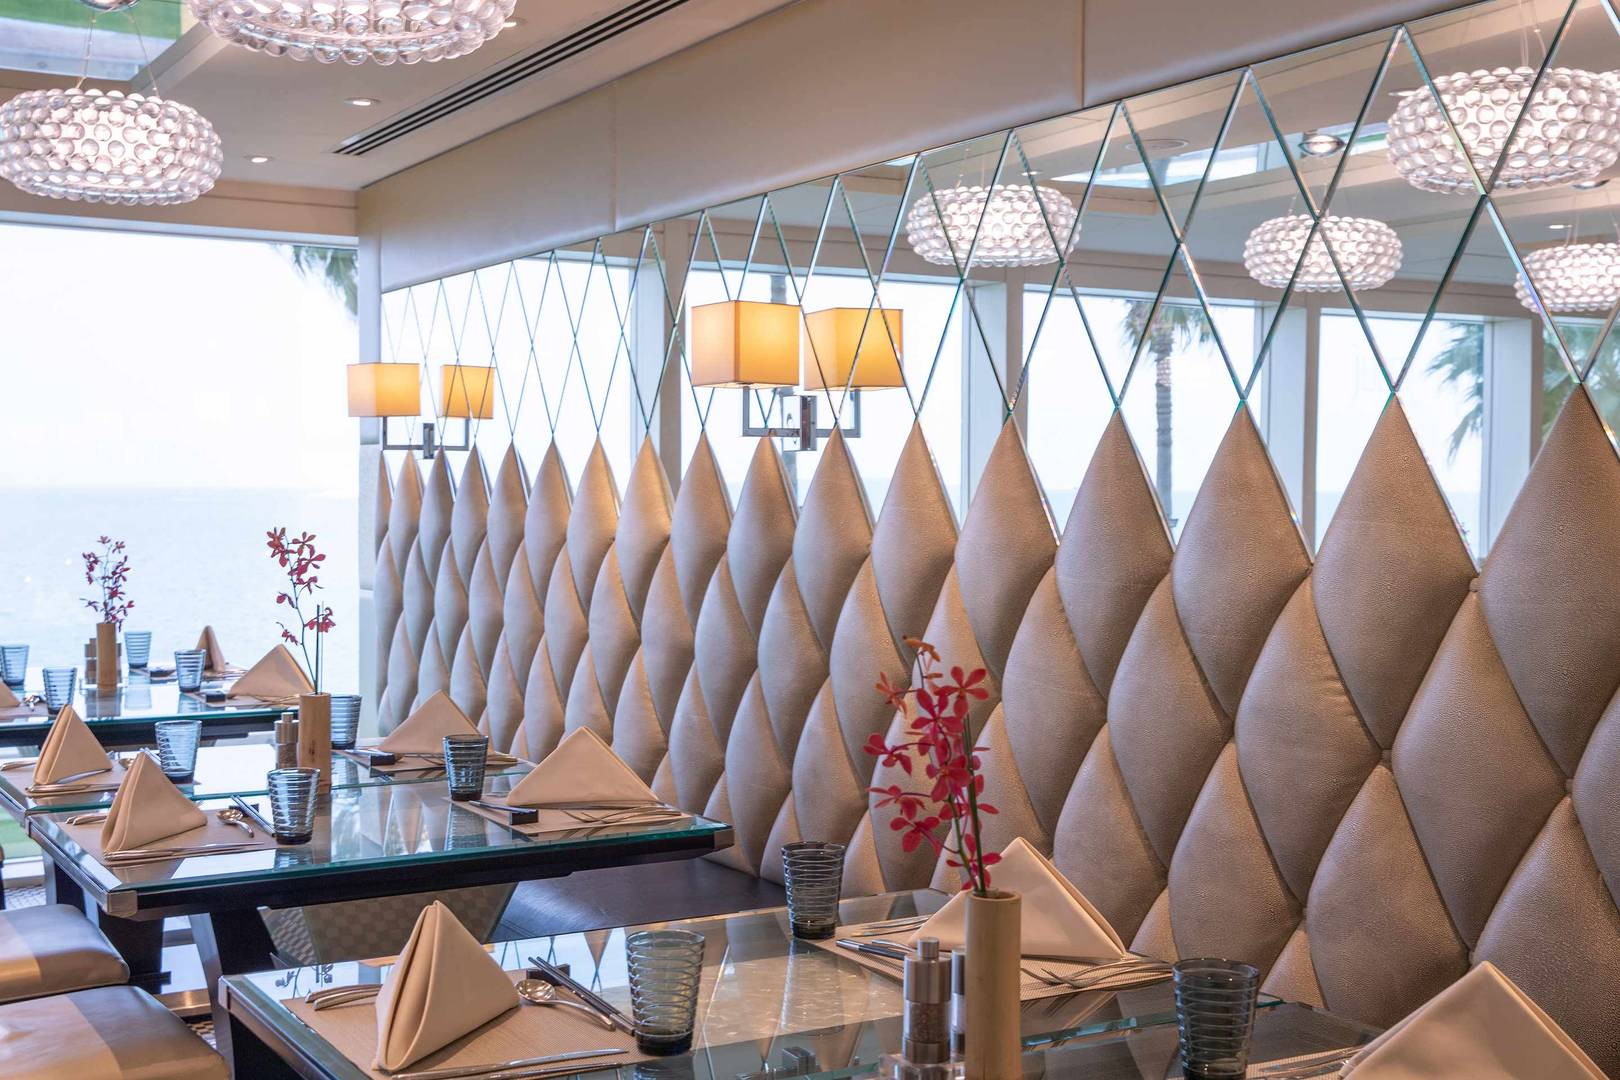 Interior of the Junsui Restaurant at Jumeirah Burj Al Arab